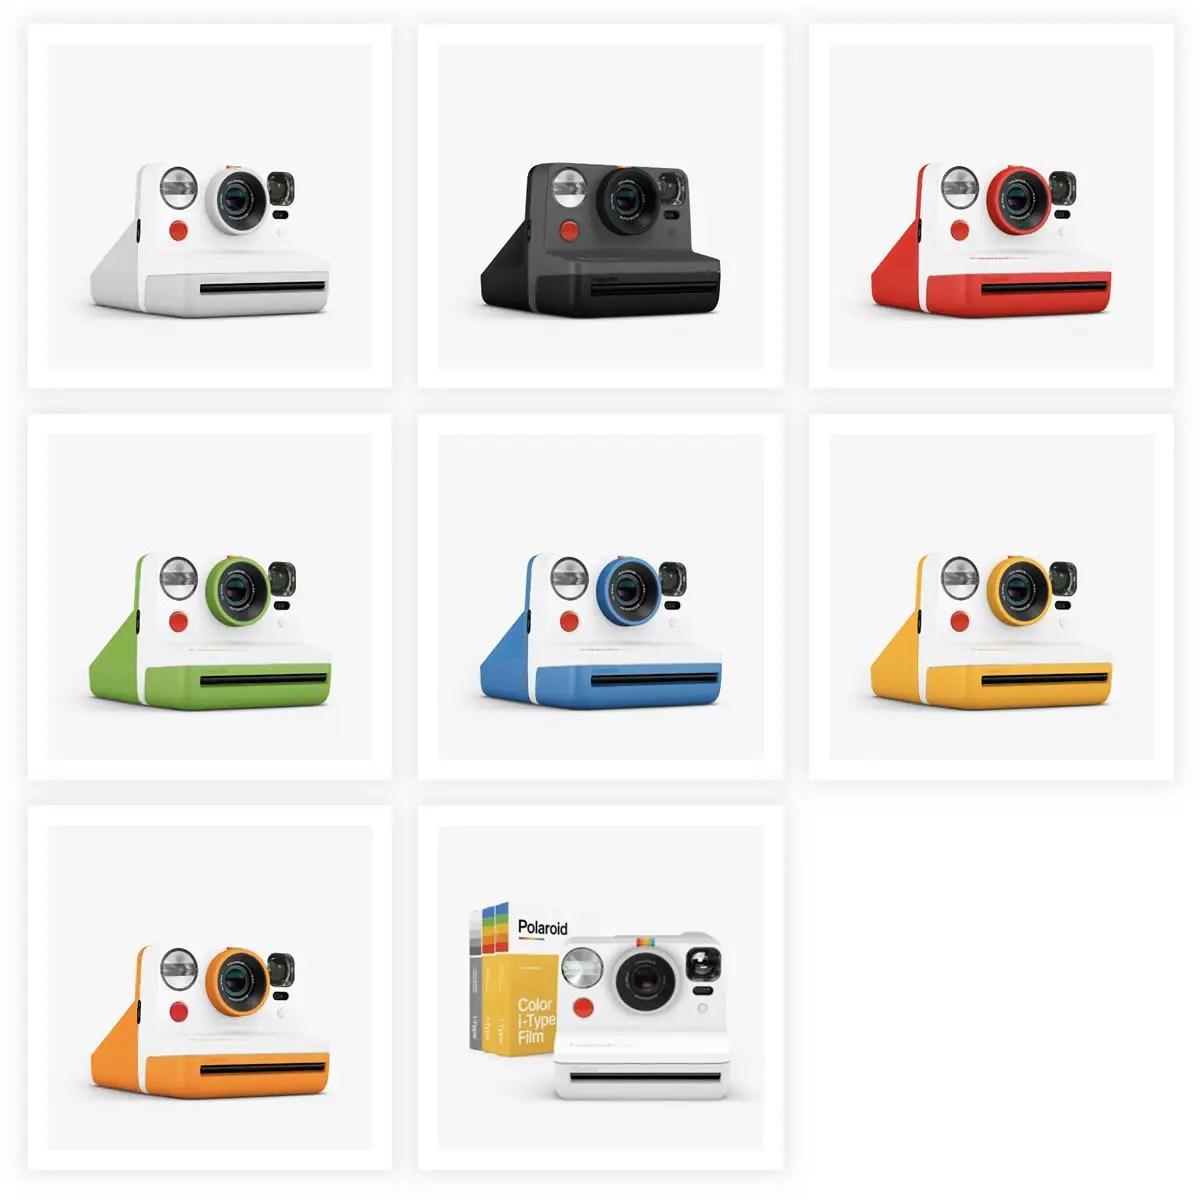 Polaroid Now. Credit: Polaroid.com